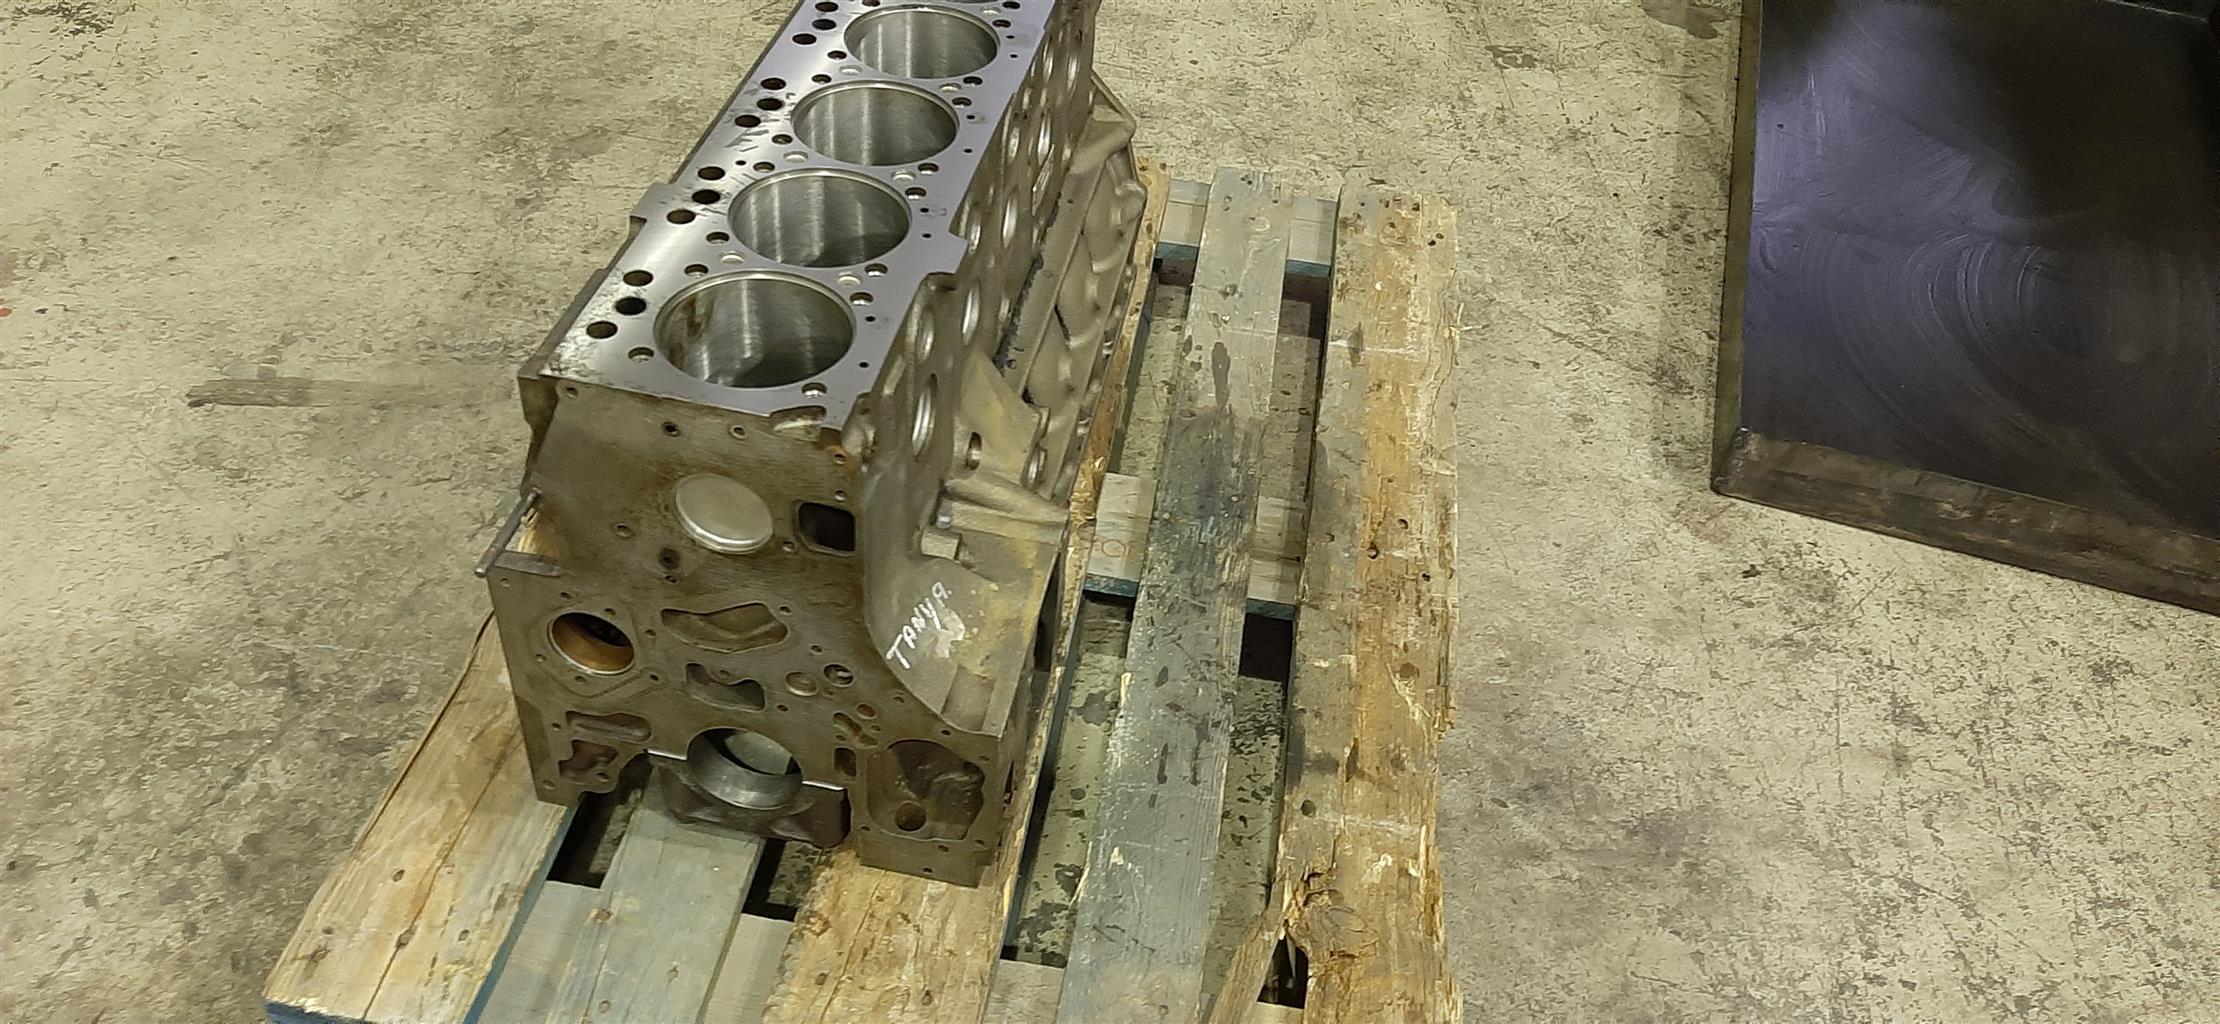 MAN D0836 LFL08 Engine Block for sale!